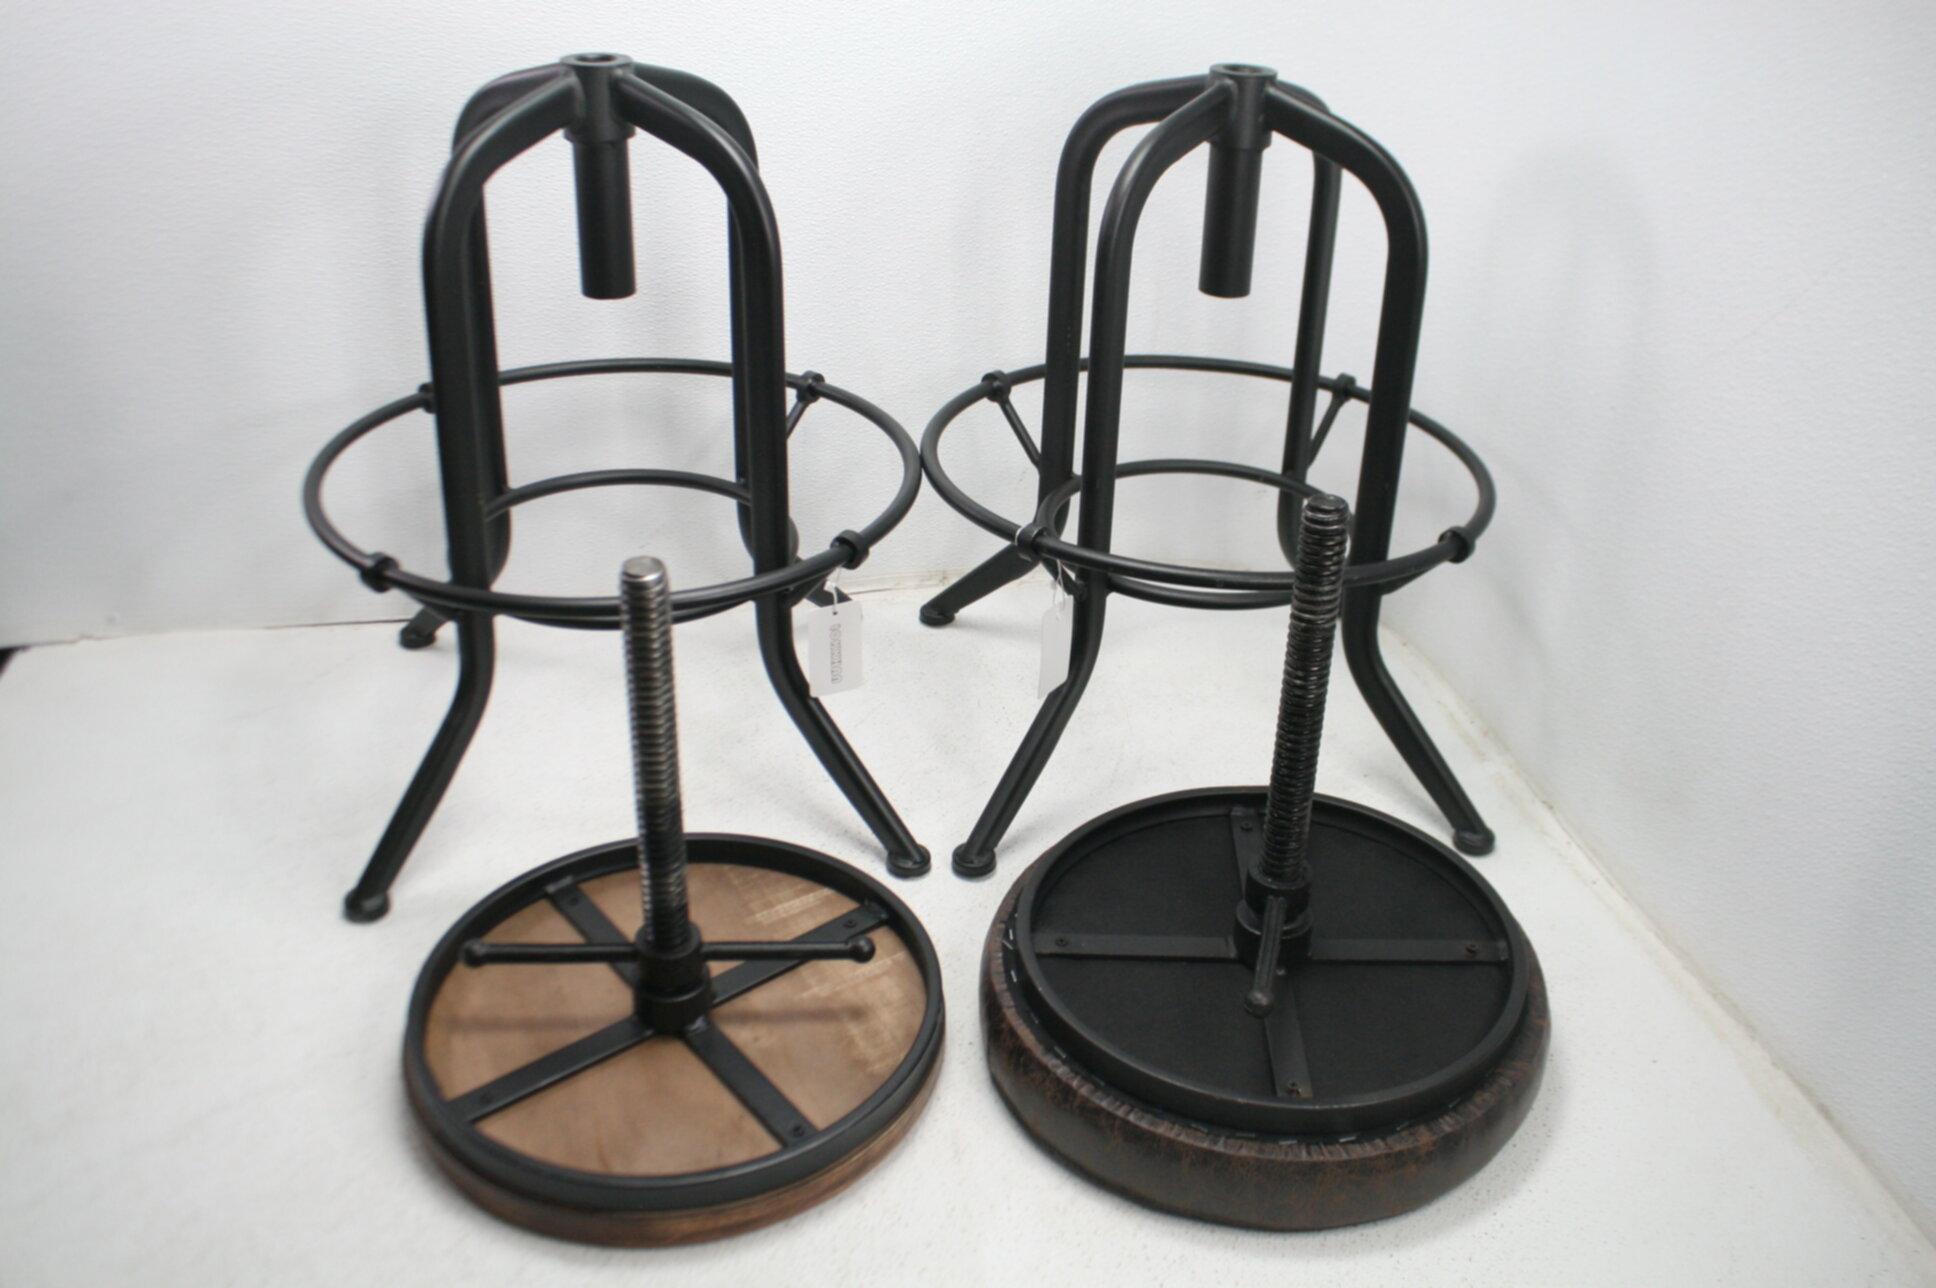 read notes set of 2 industrial bar stool vintage adjustable metal rustic chair